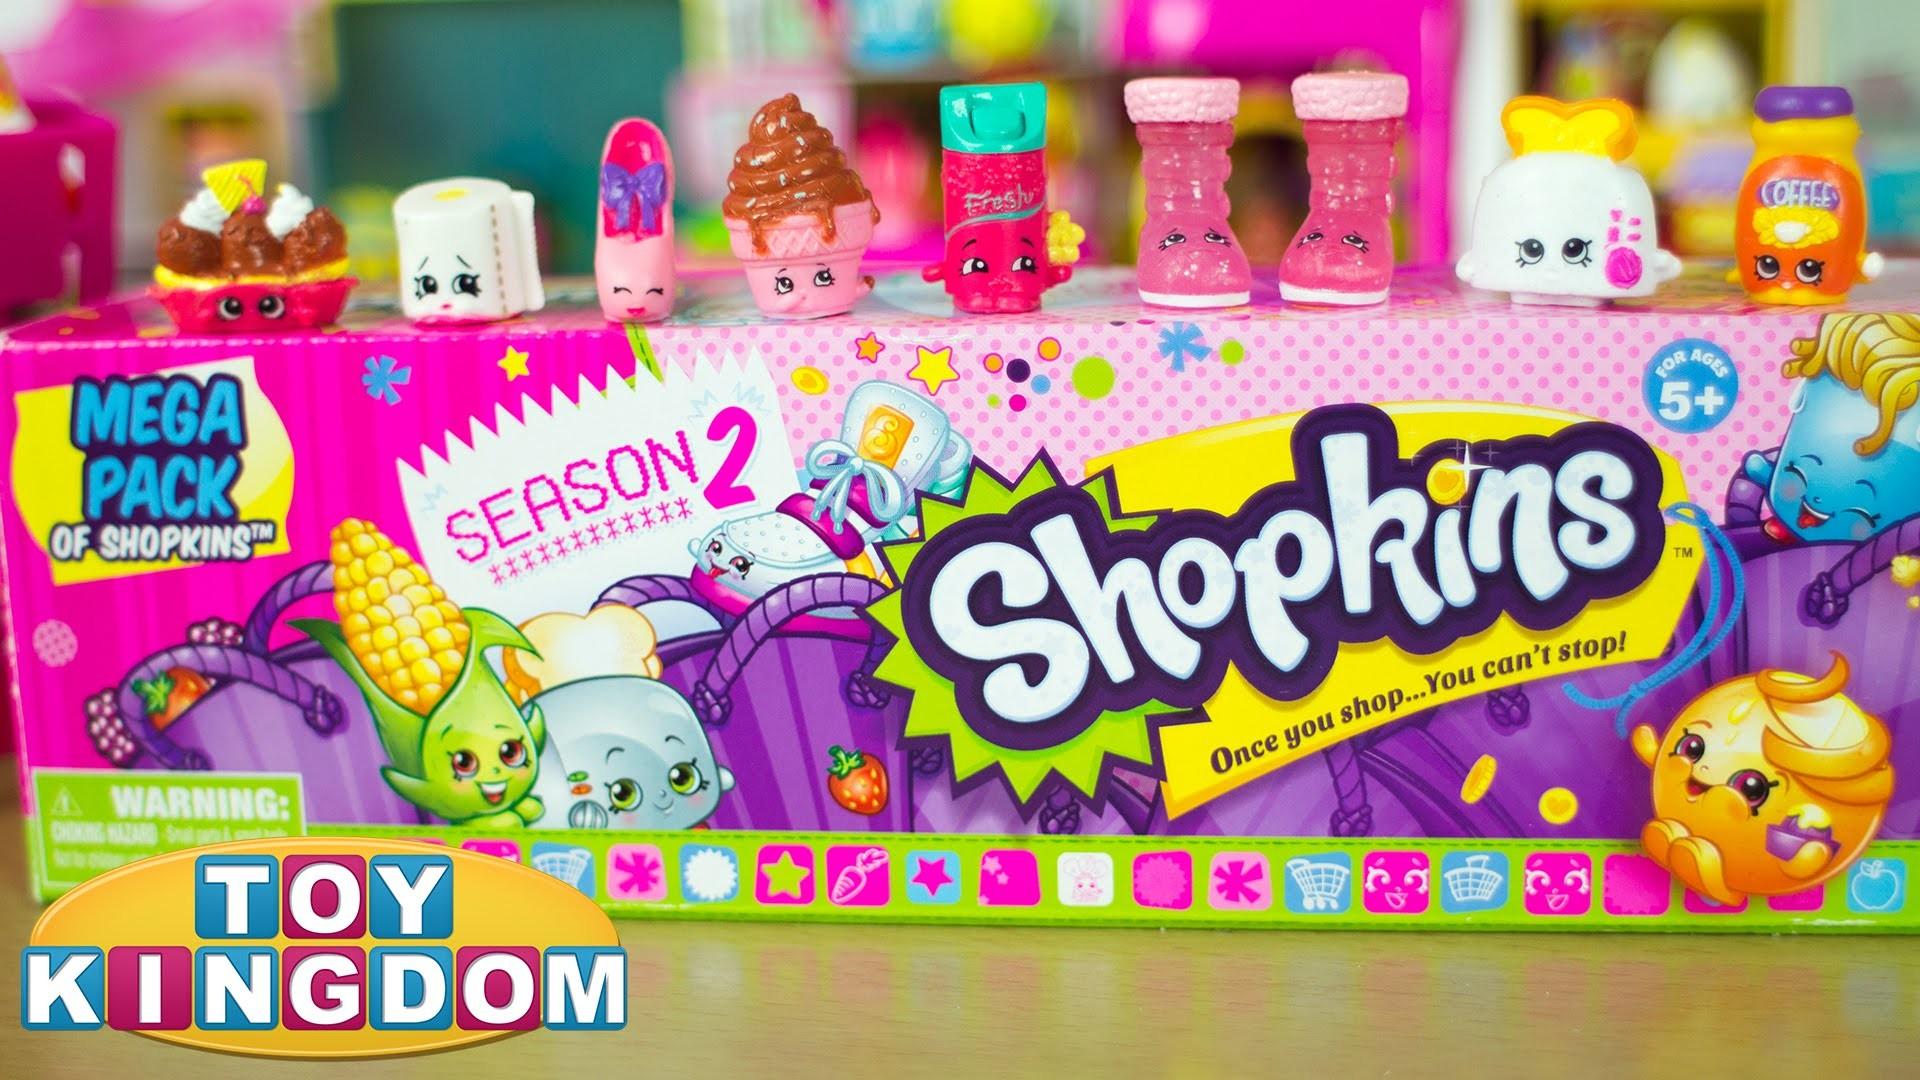 Shopkins Season 2 Mega Pack Opening – 20 Super Cute Shopkins Inside! –  YouTube